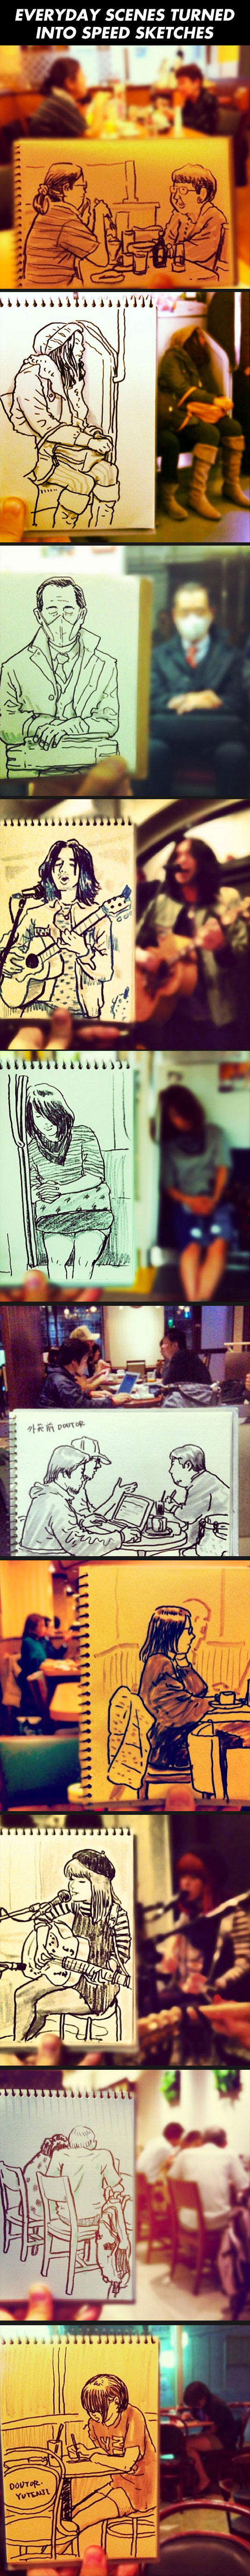 sketch-everyday-scenes-drawing-notebook